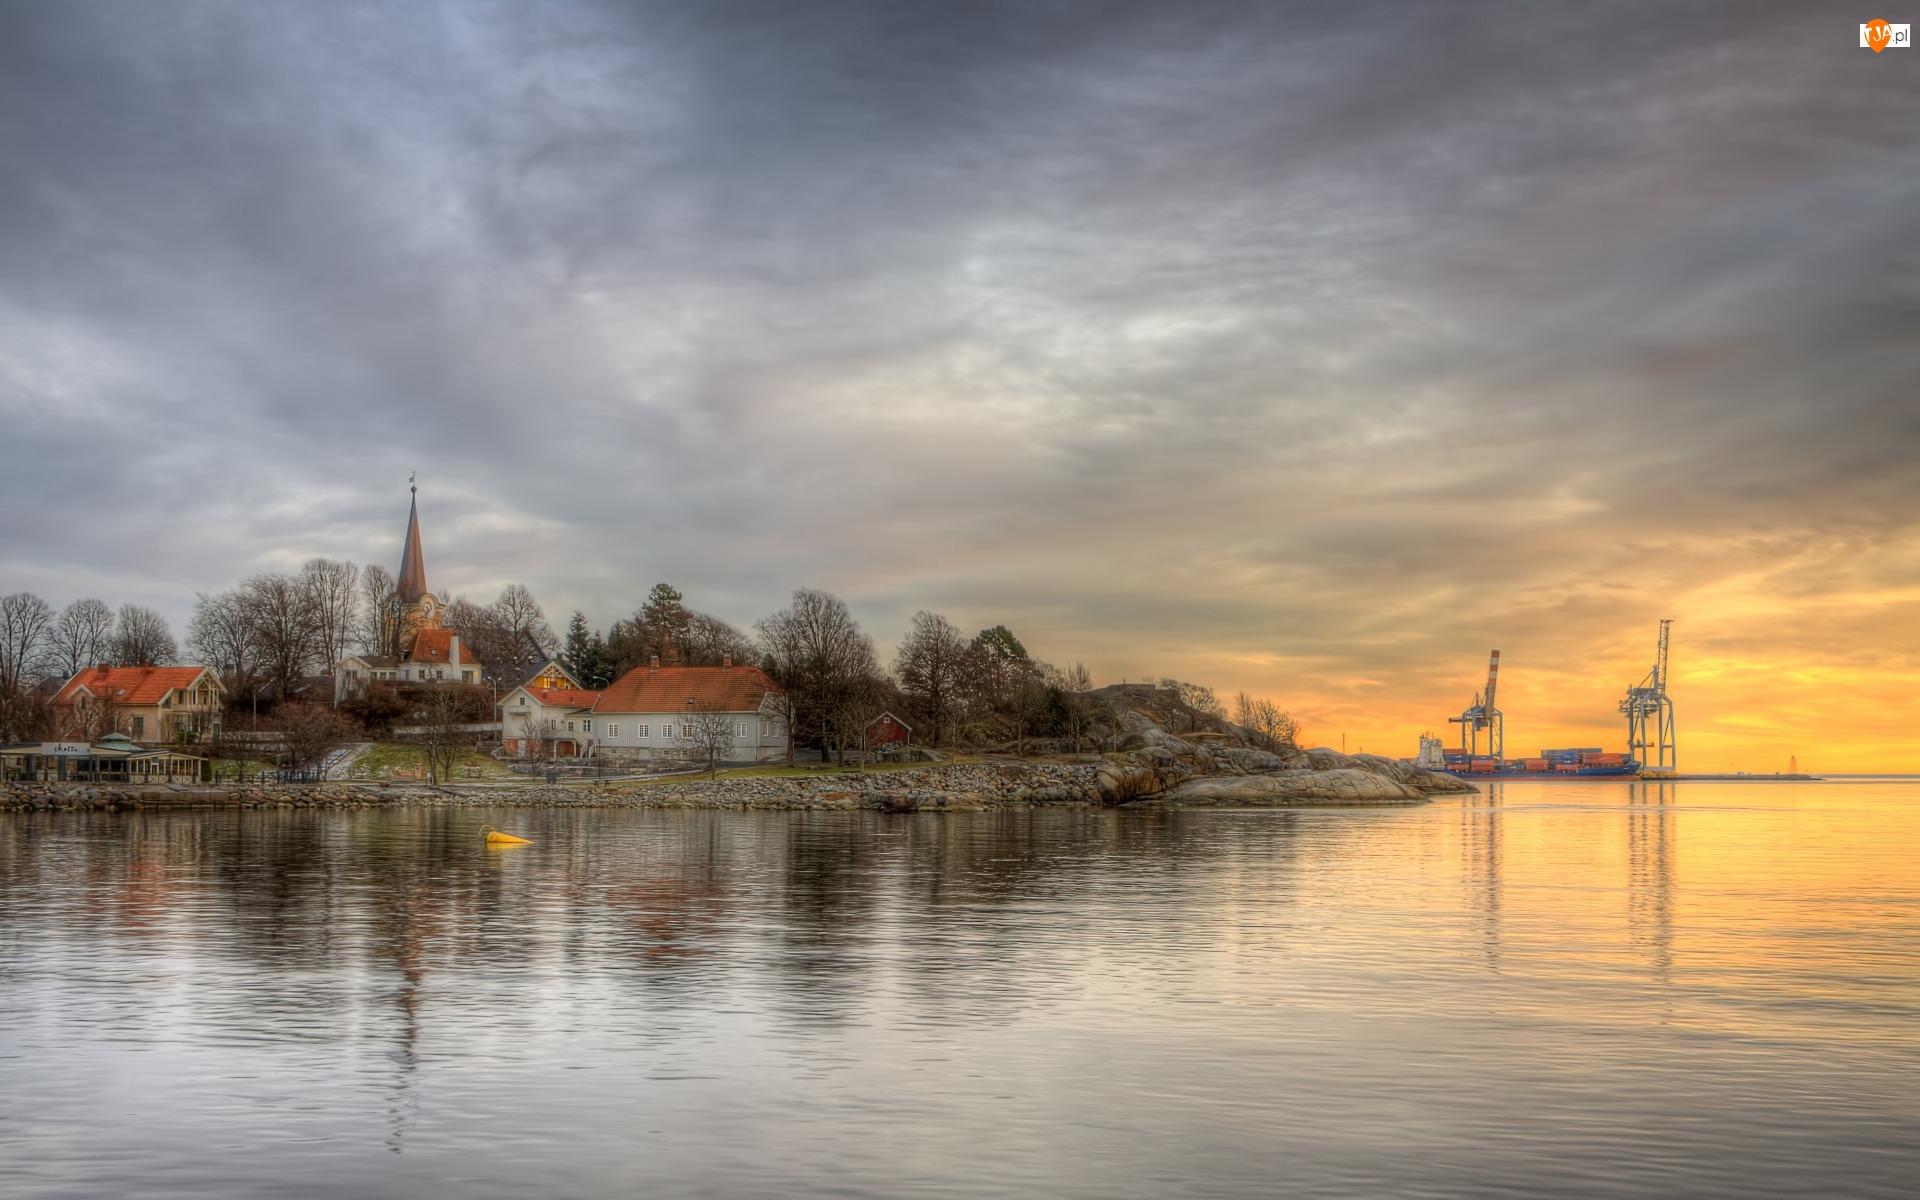 Kościół, Morze, Larvik, Norwegia, Dźwigi, Zatoka Oslofjord, Domy